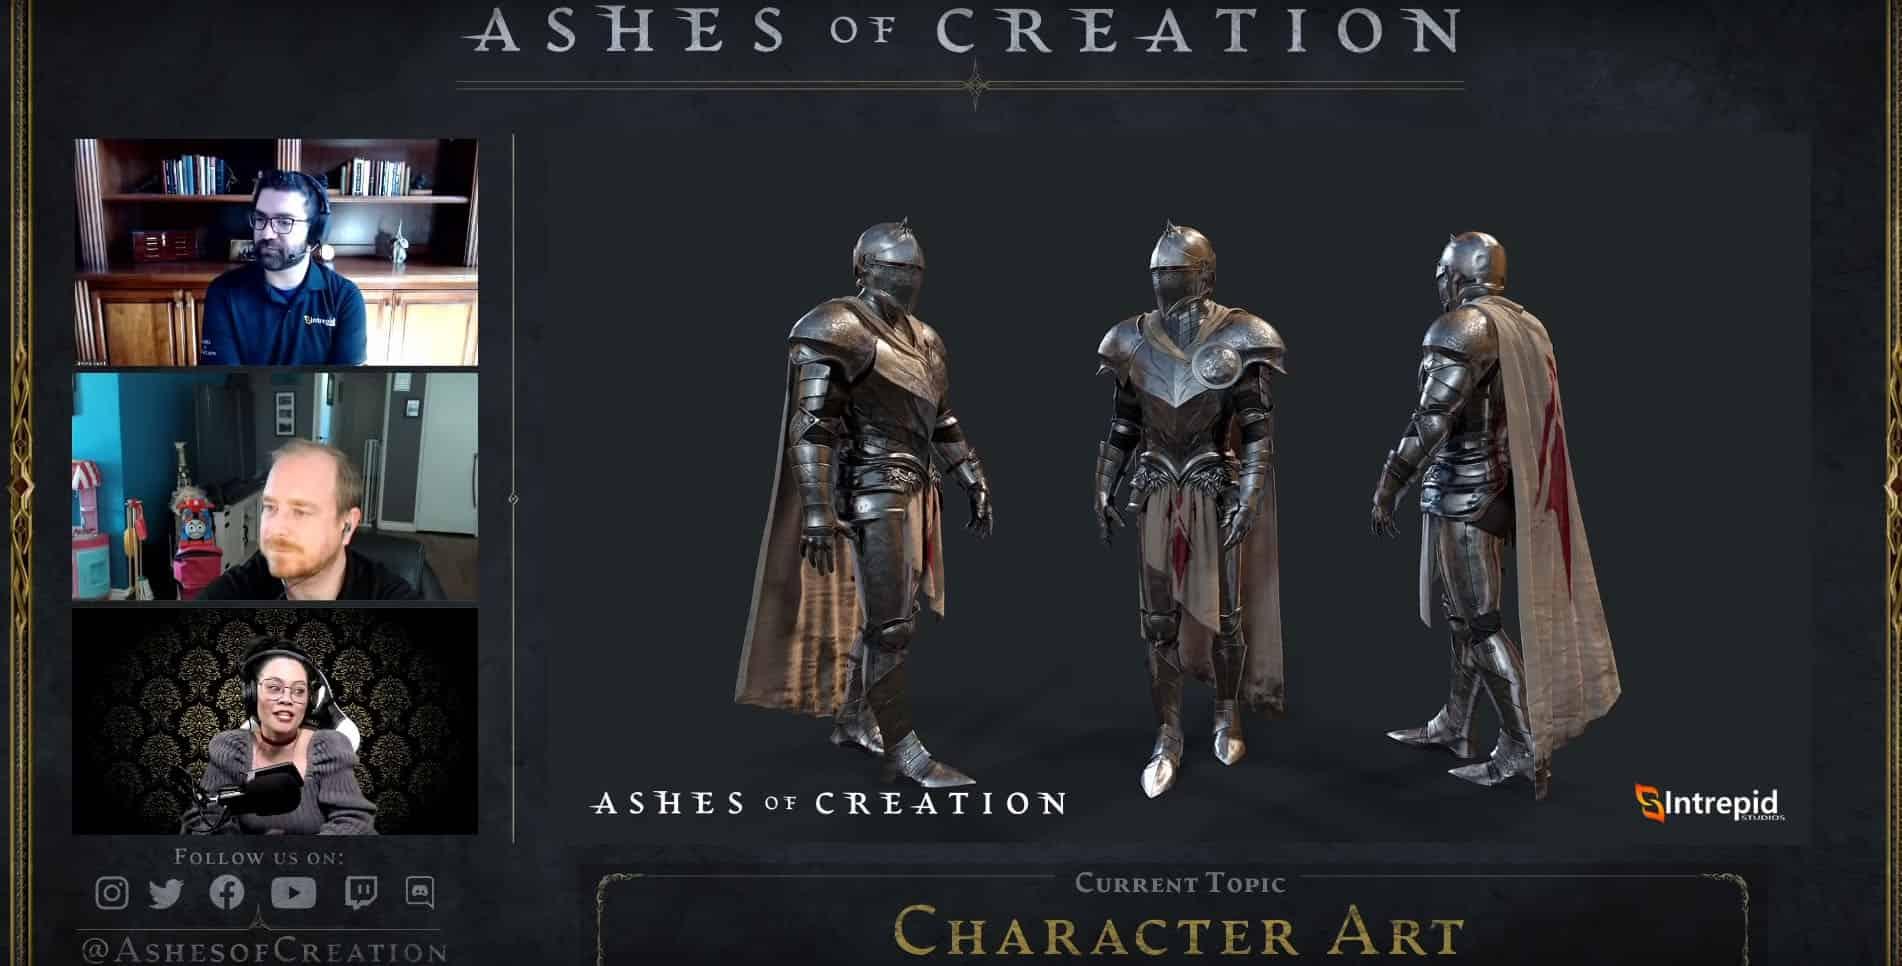 Ashes of Creation Development Update Talks Hiring, Website Design, Gameplay, And Art 8